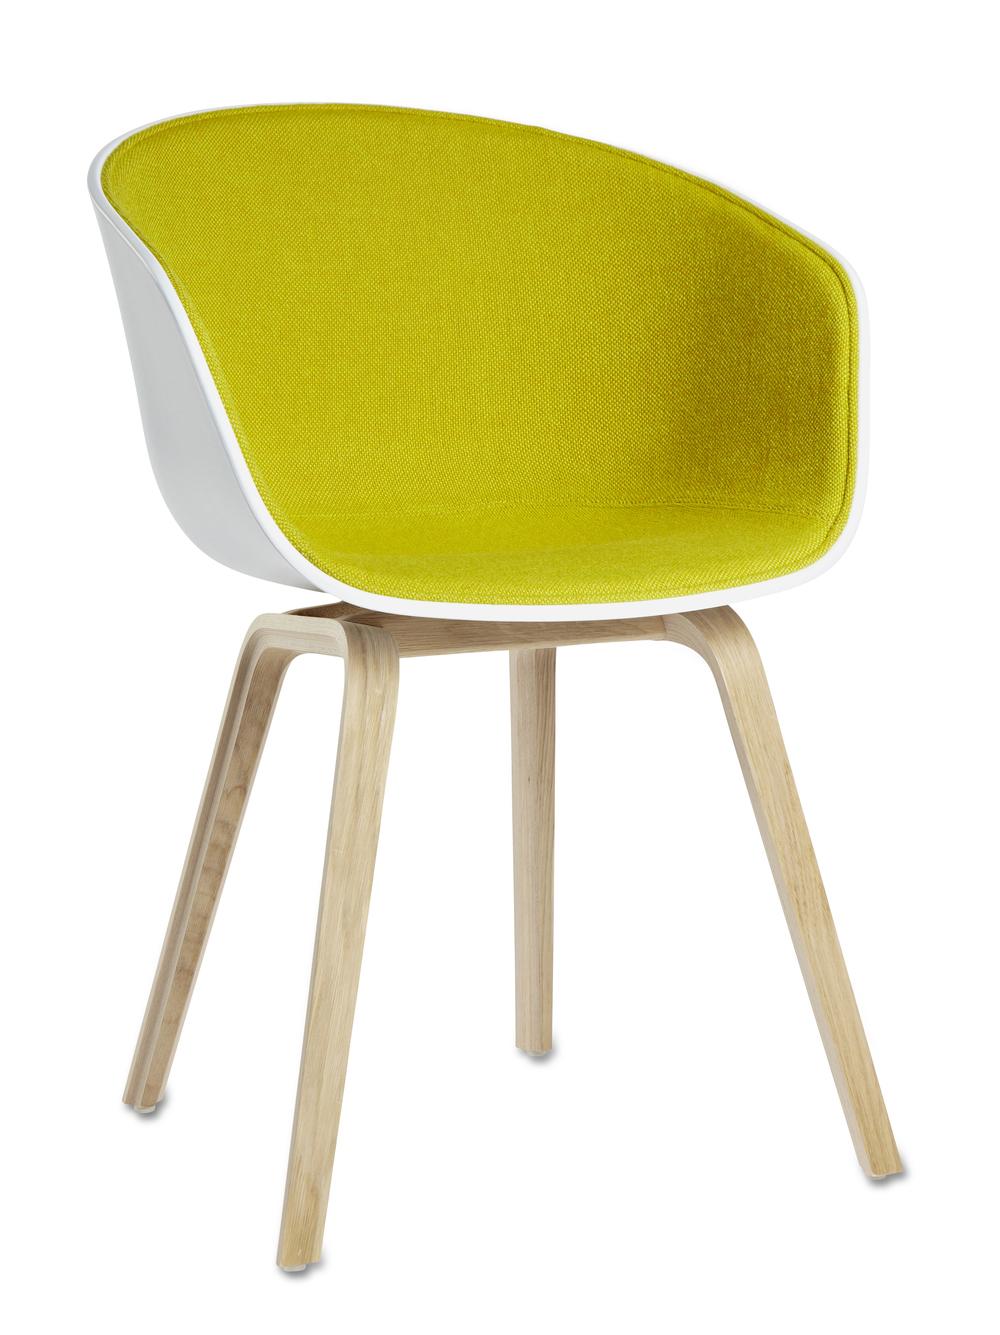 AAC22 Oak Soaped Base white w. front uph hallingdal 420 HAY About a chair design stoel Loncin design meubel zetel Leuven Brussels mechelen antwerpen vlaams-branbant Limburg Hasselt Tongeren Genk Sint-Truiden Zoutleeuw.jpg